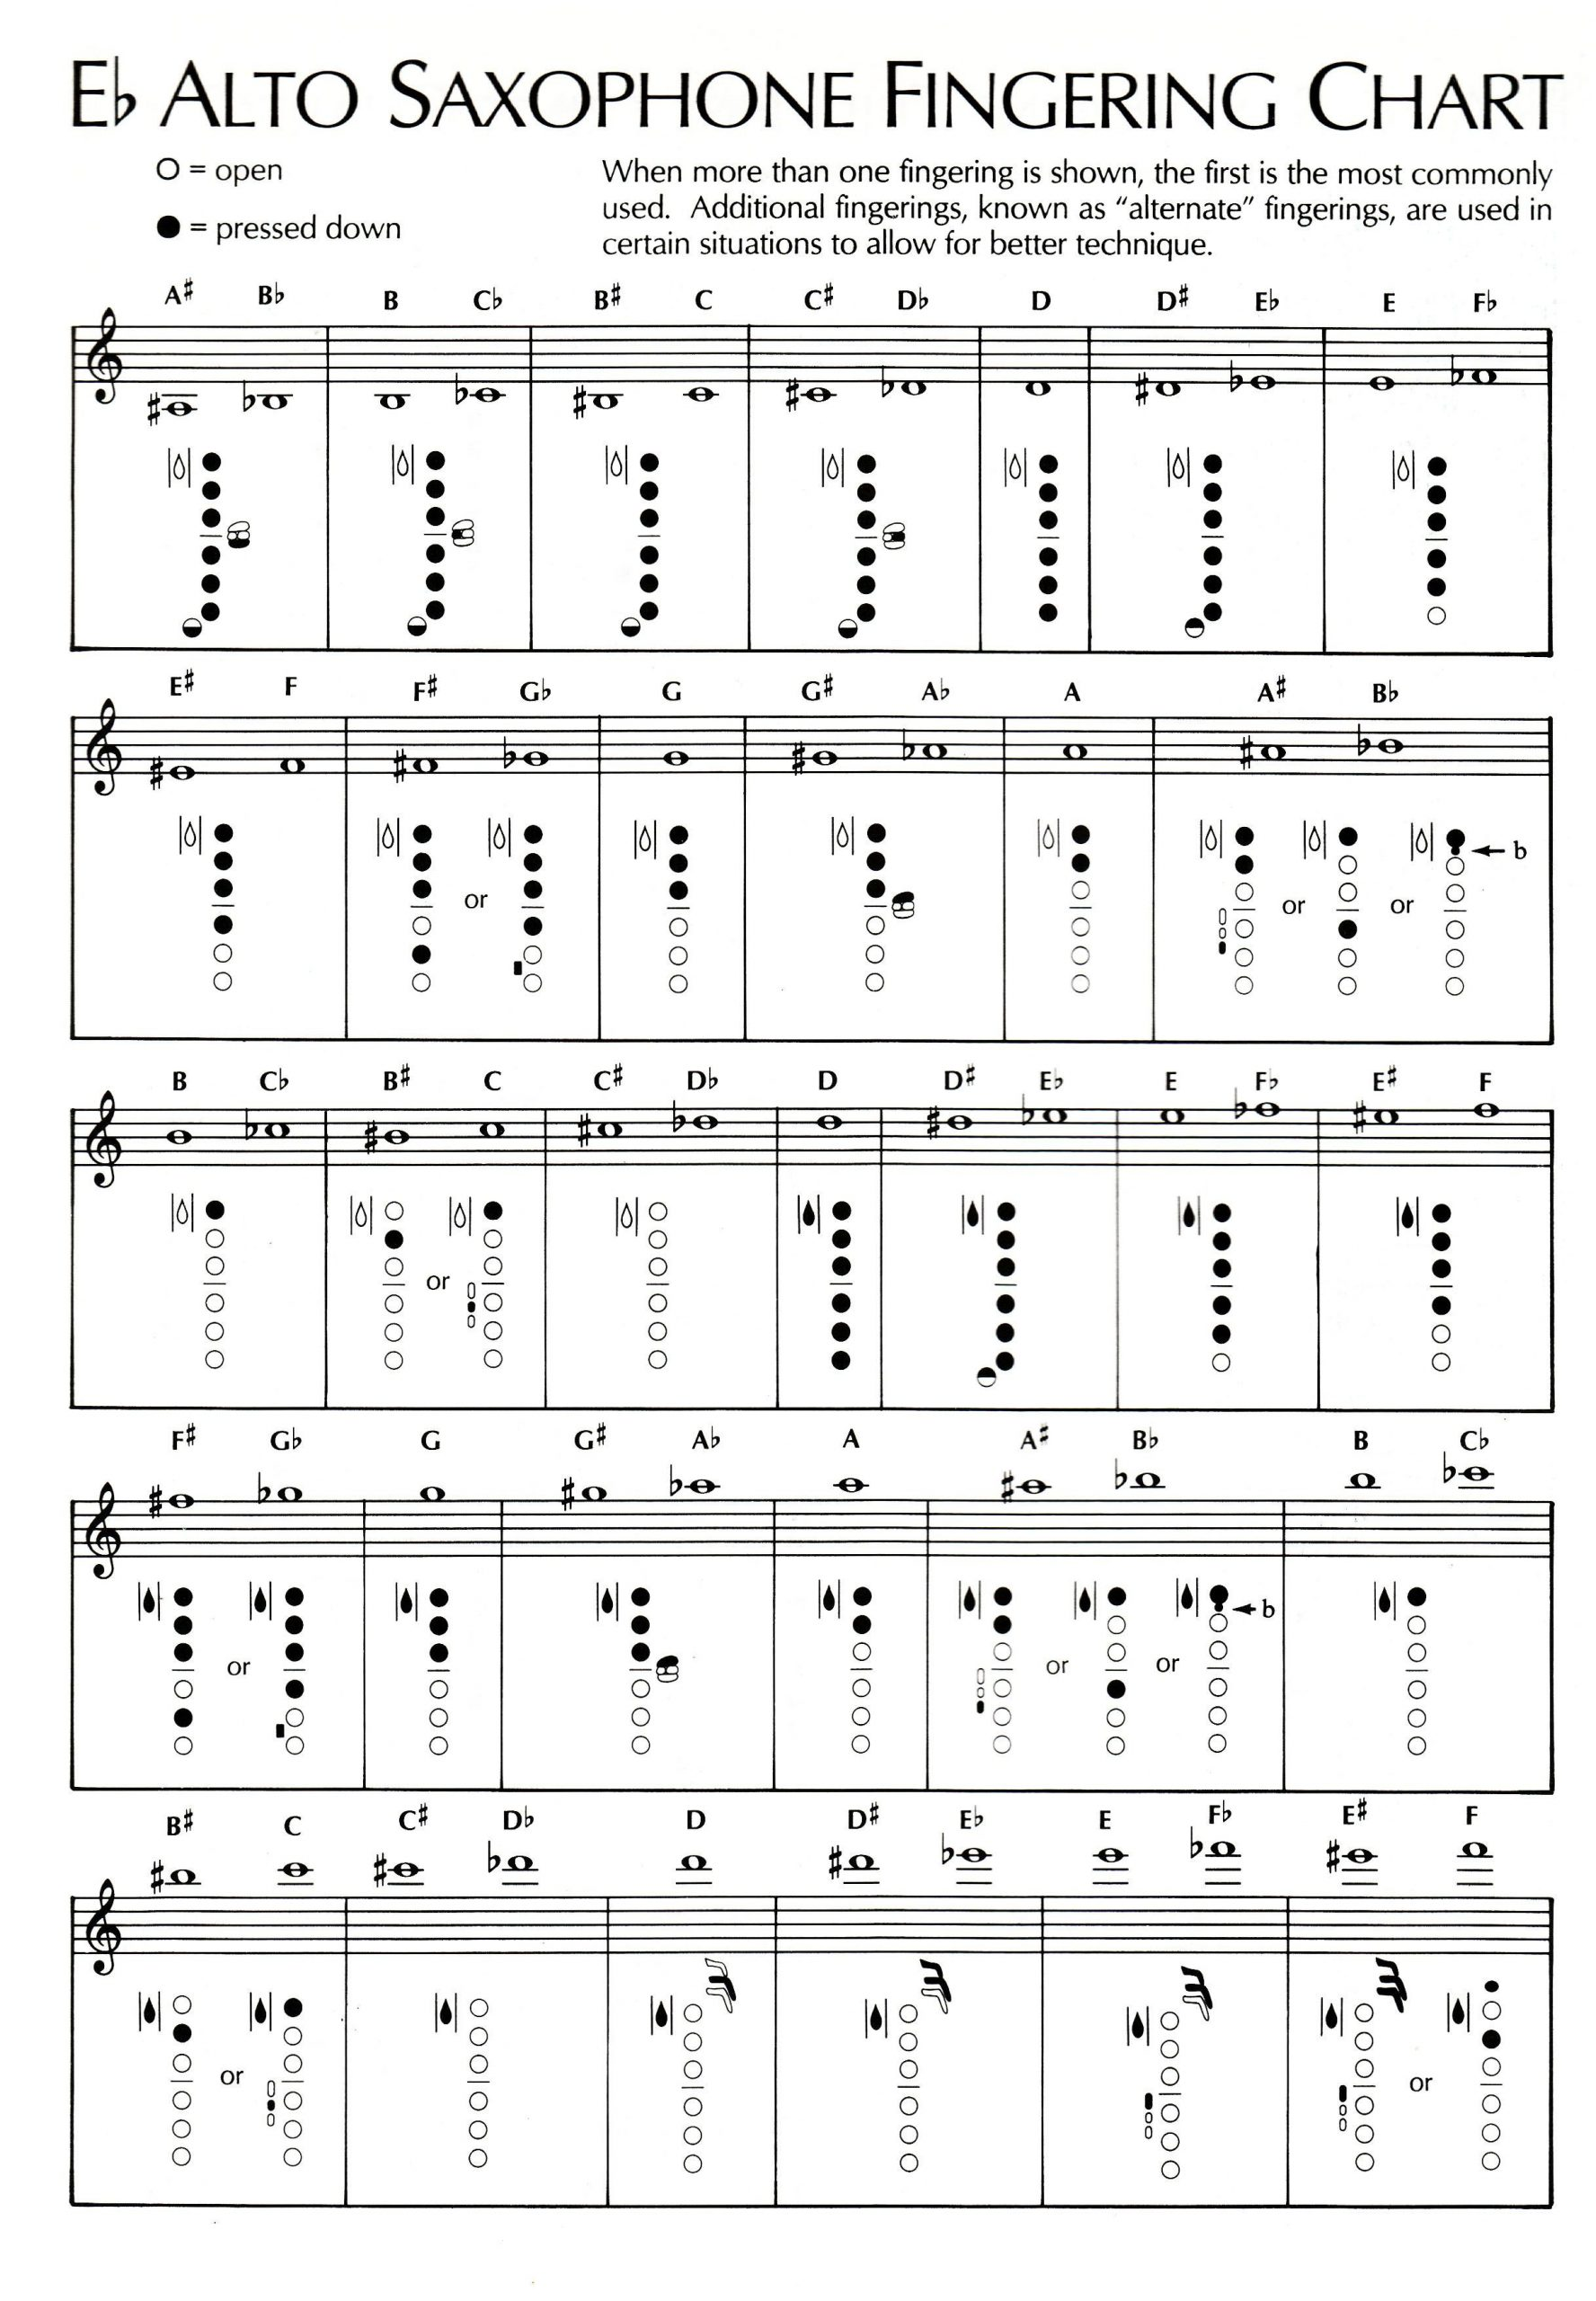 Saxophone Fingering Charts Pin On Saxophone Madness Of Saxophone Fingering Charts